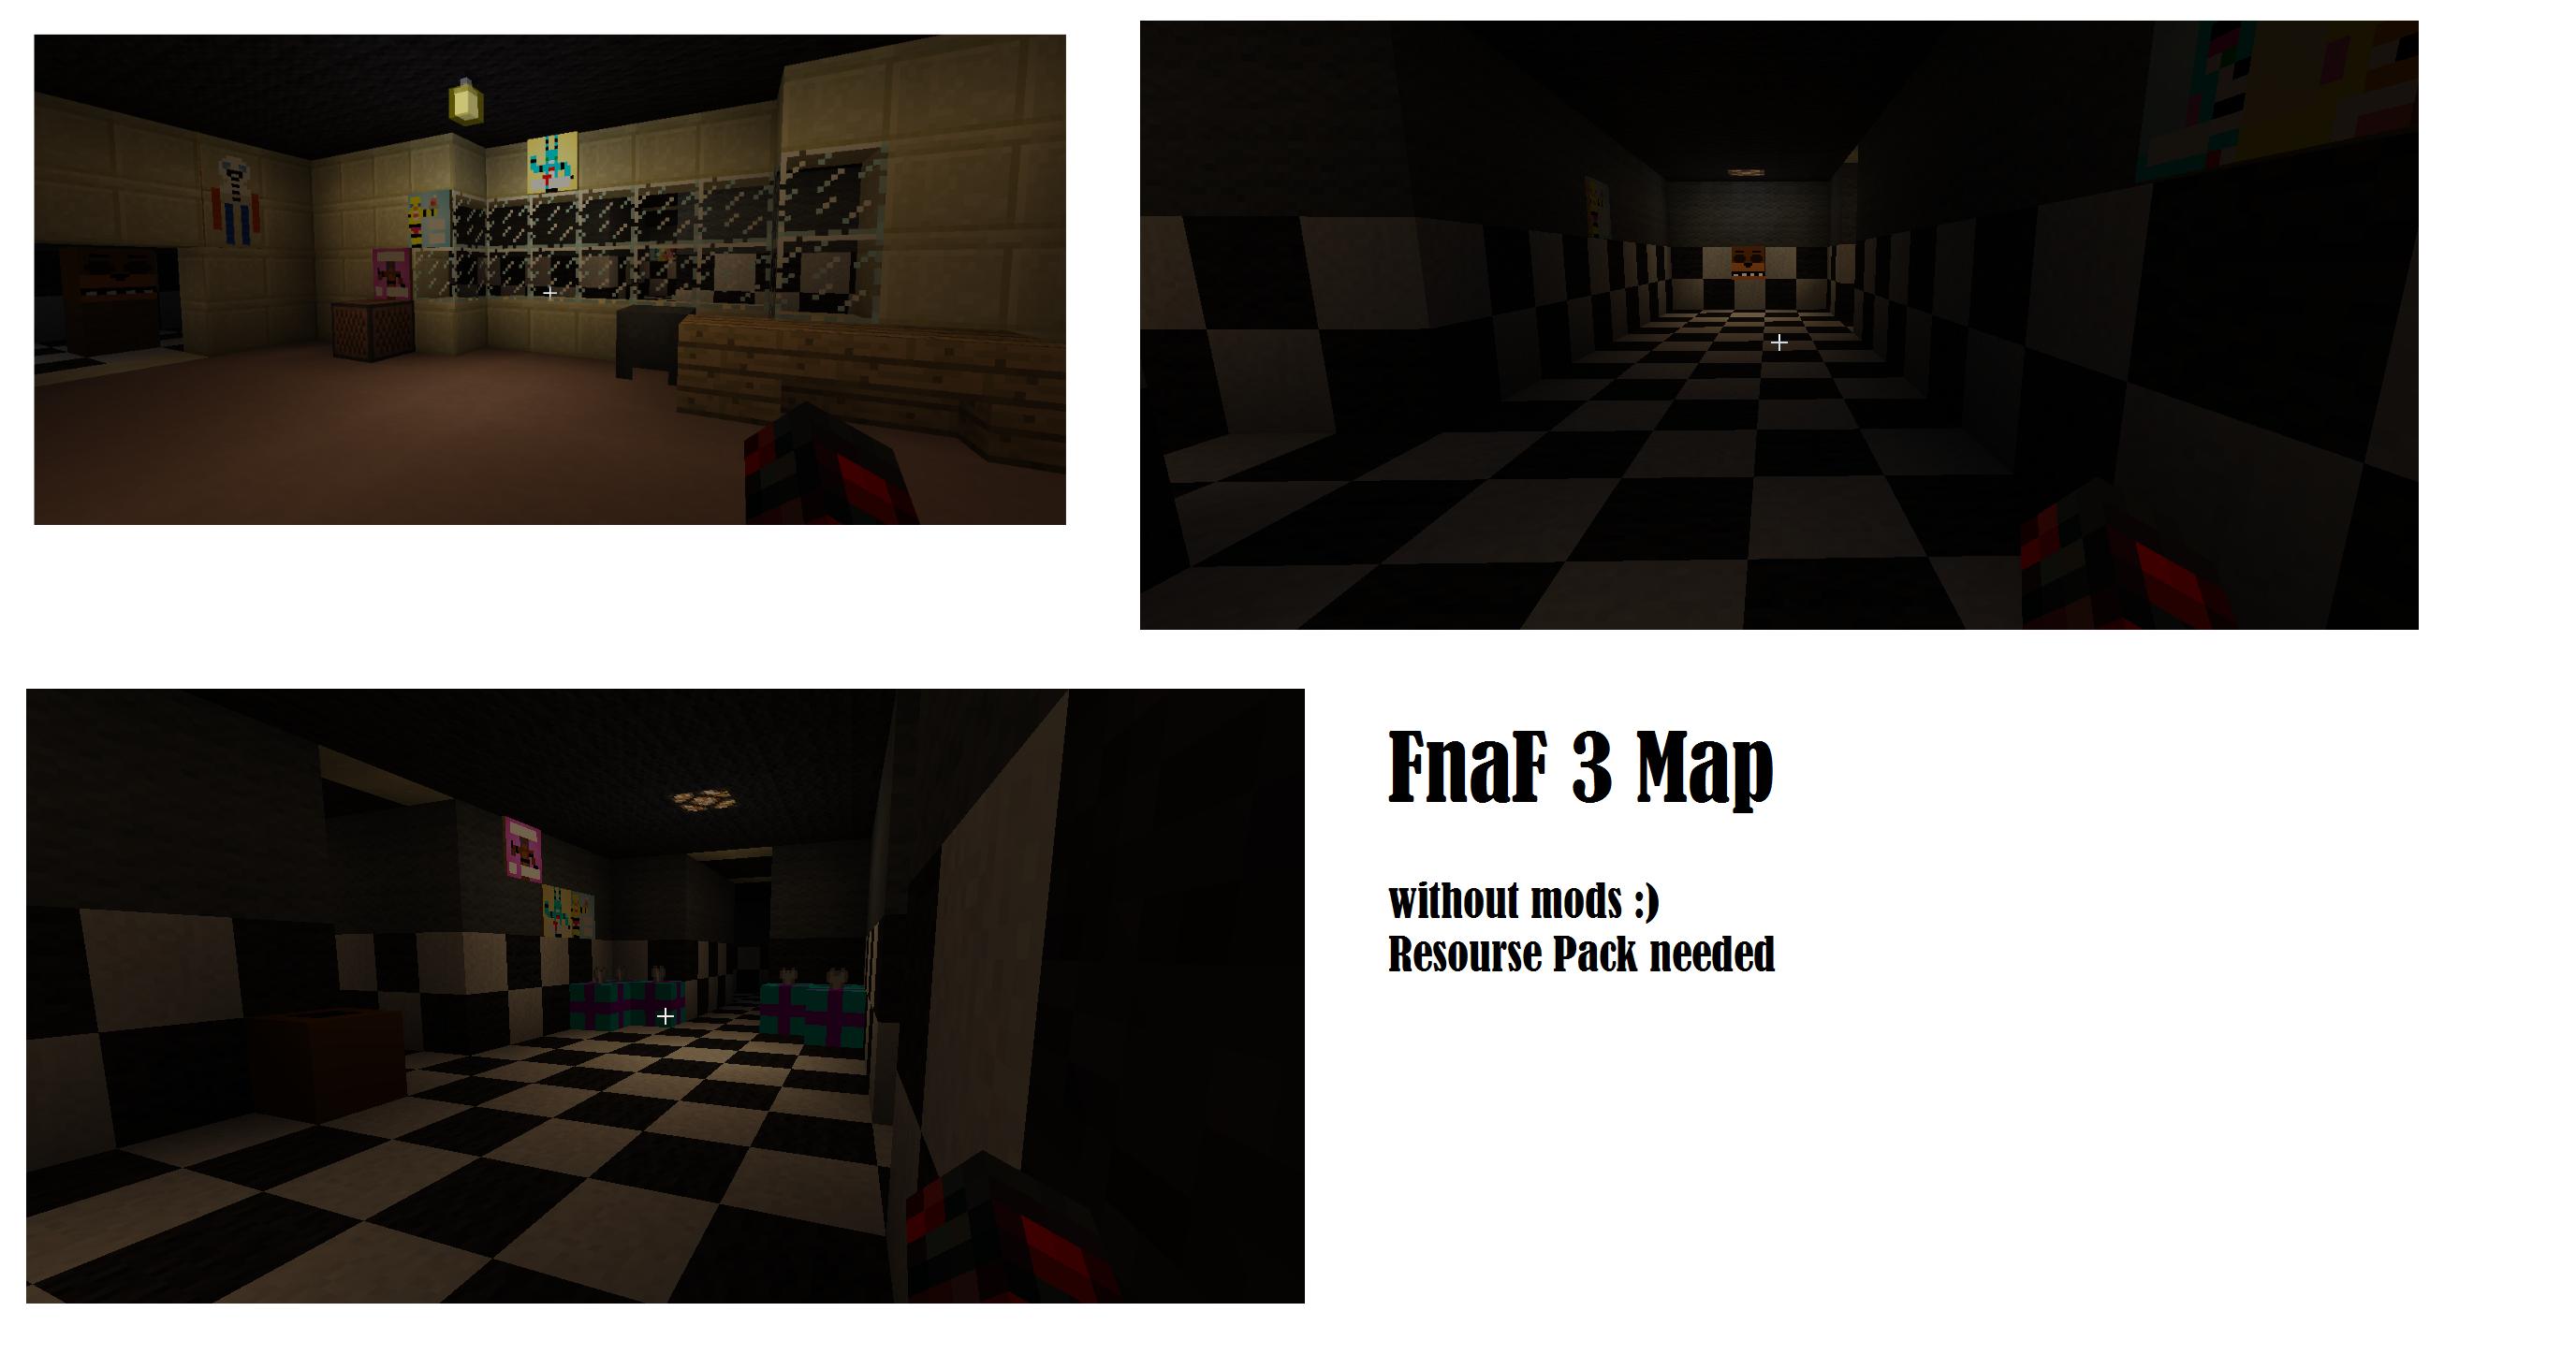 карта fnaf 2 v0.2 на minecraft 1.7.2 #8